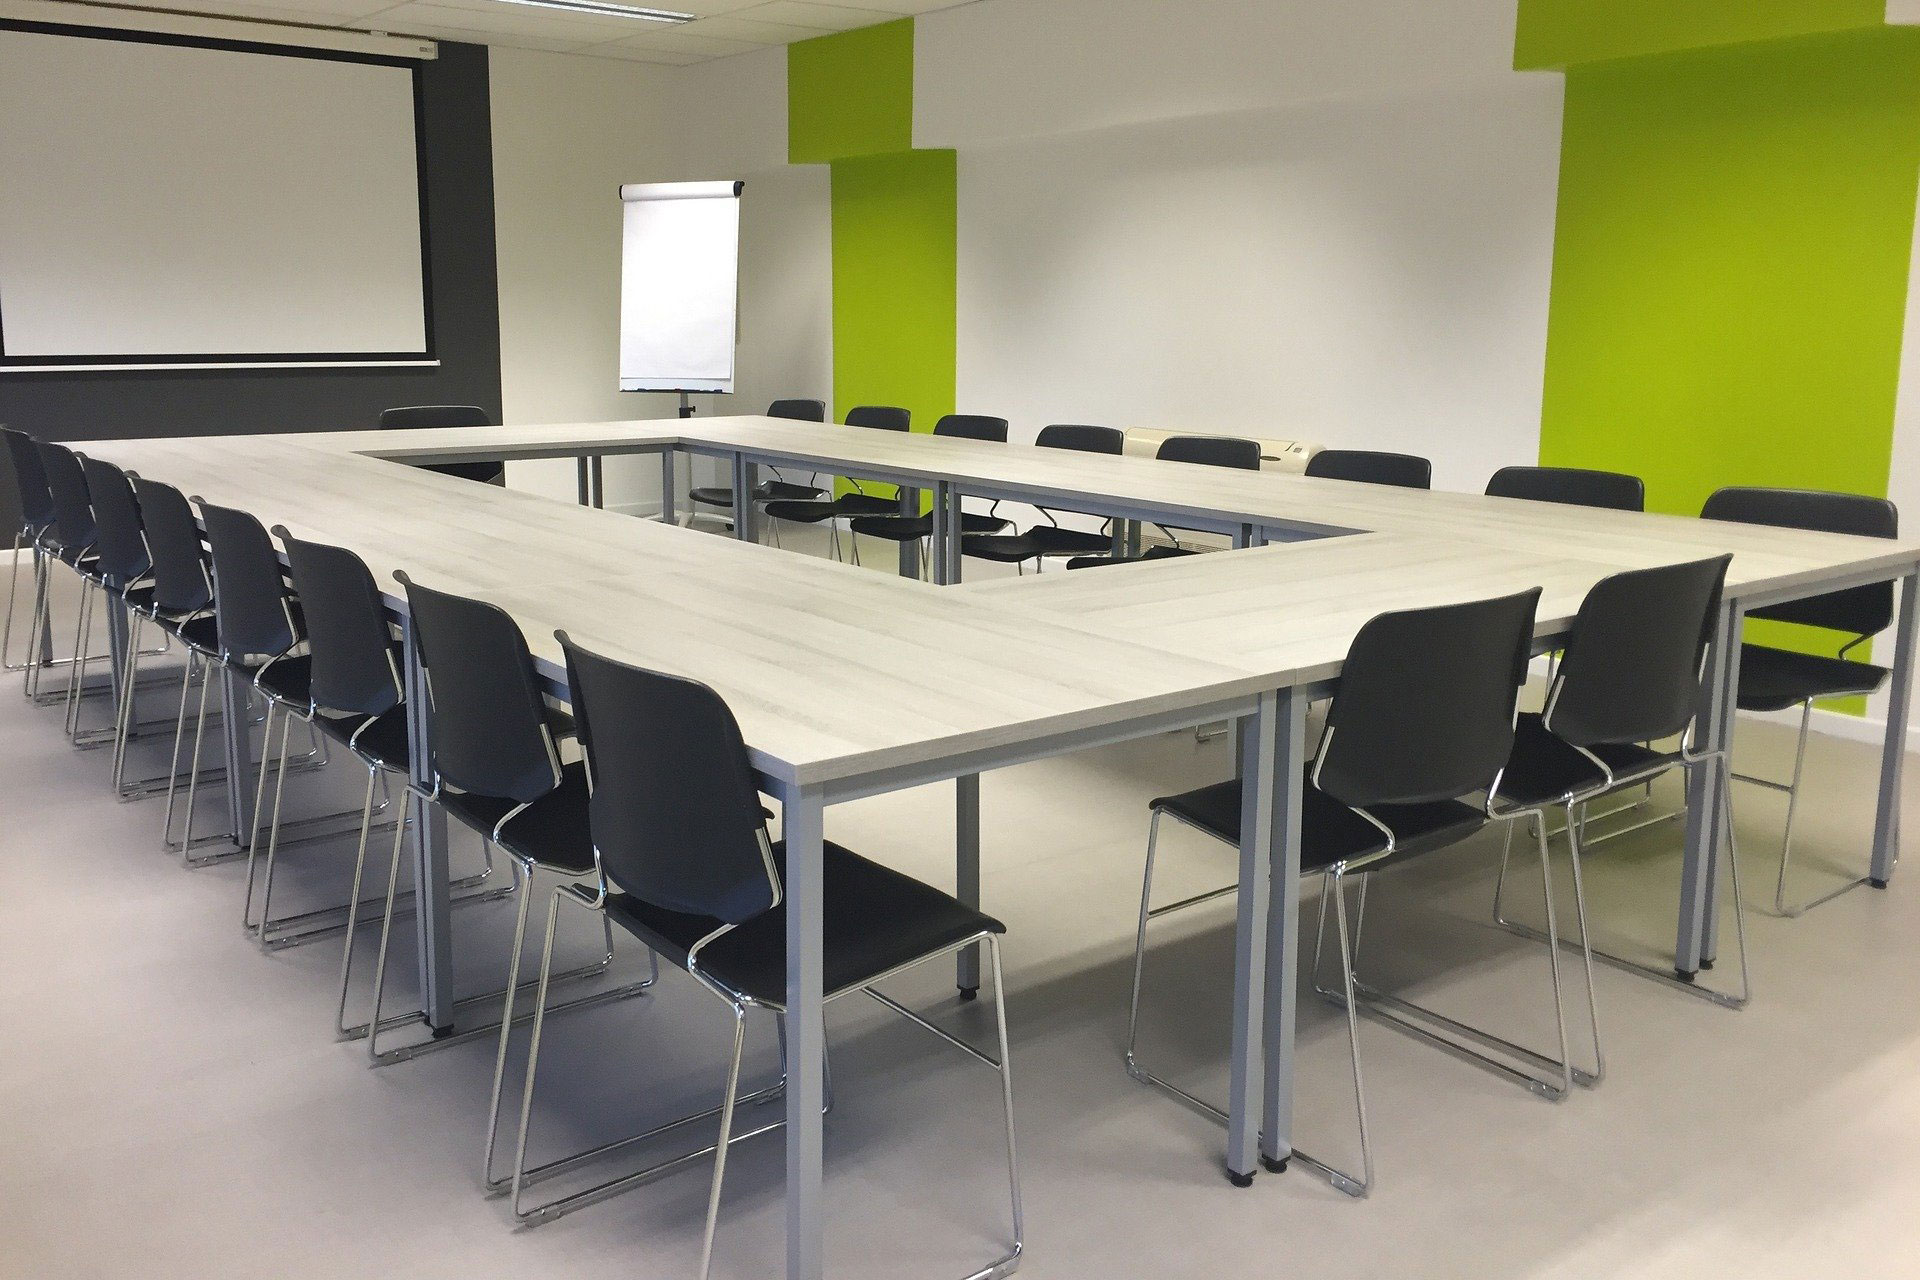 Konferenzraum, Foto: pixabay / Frantichek